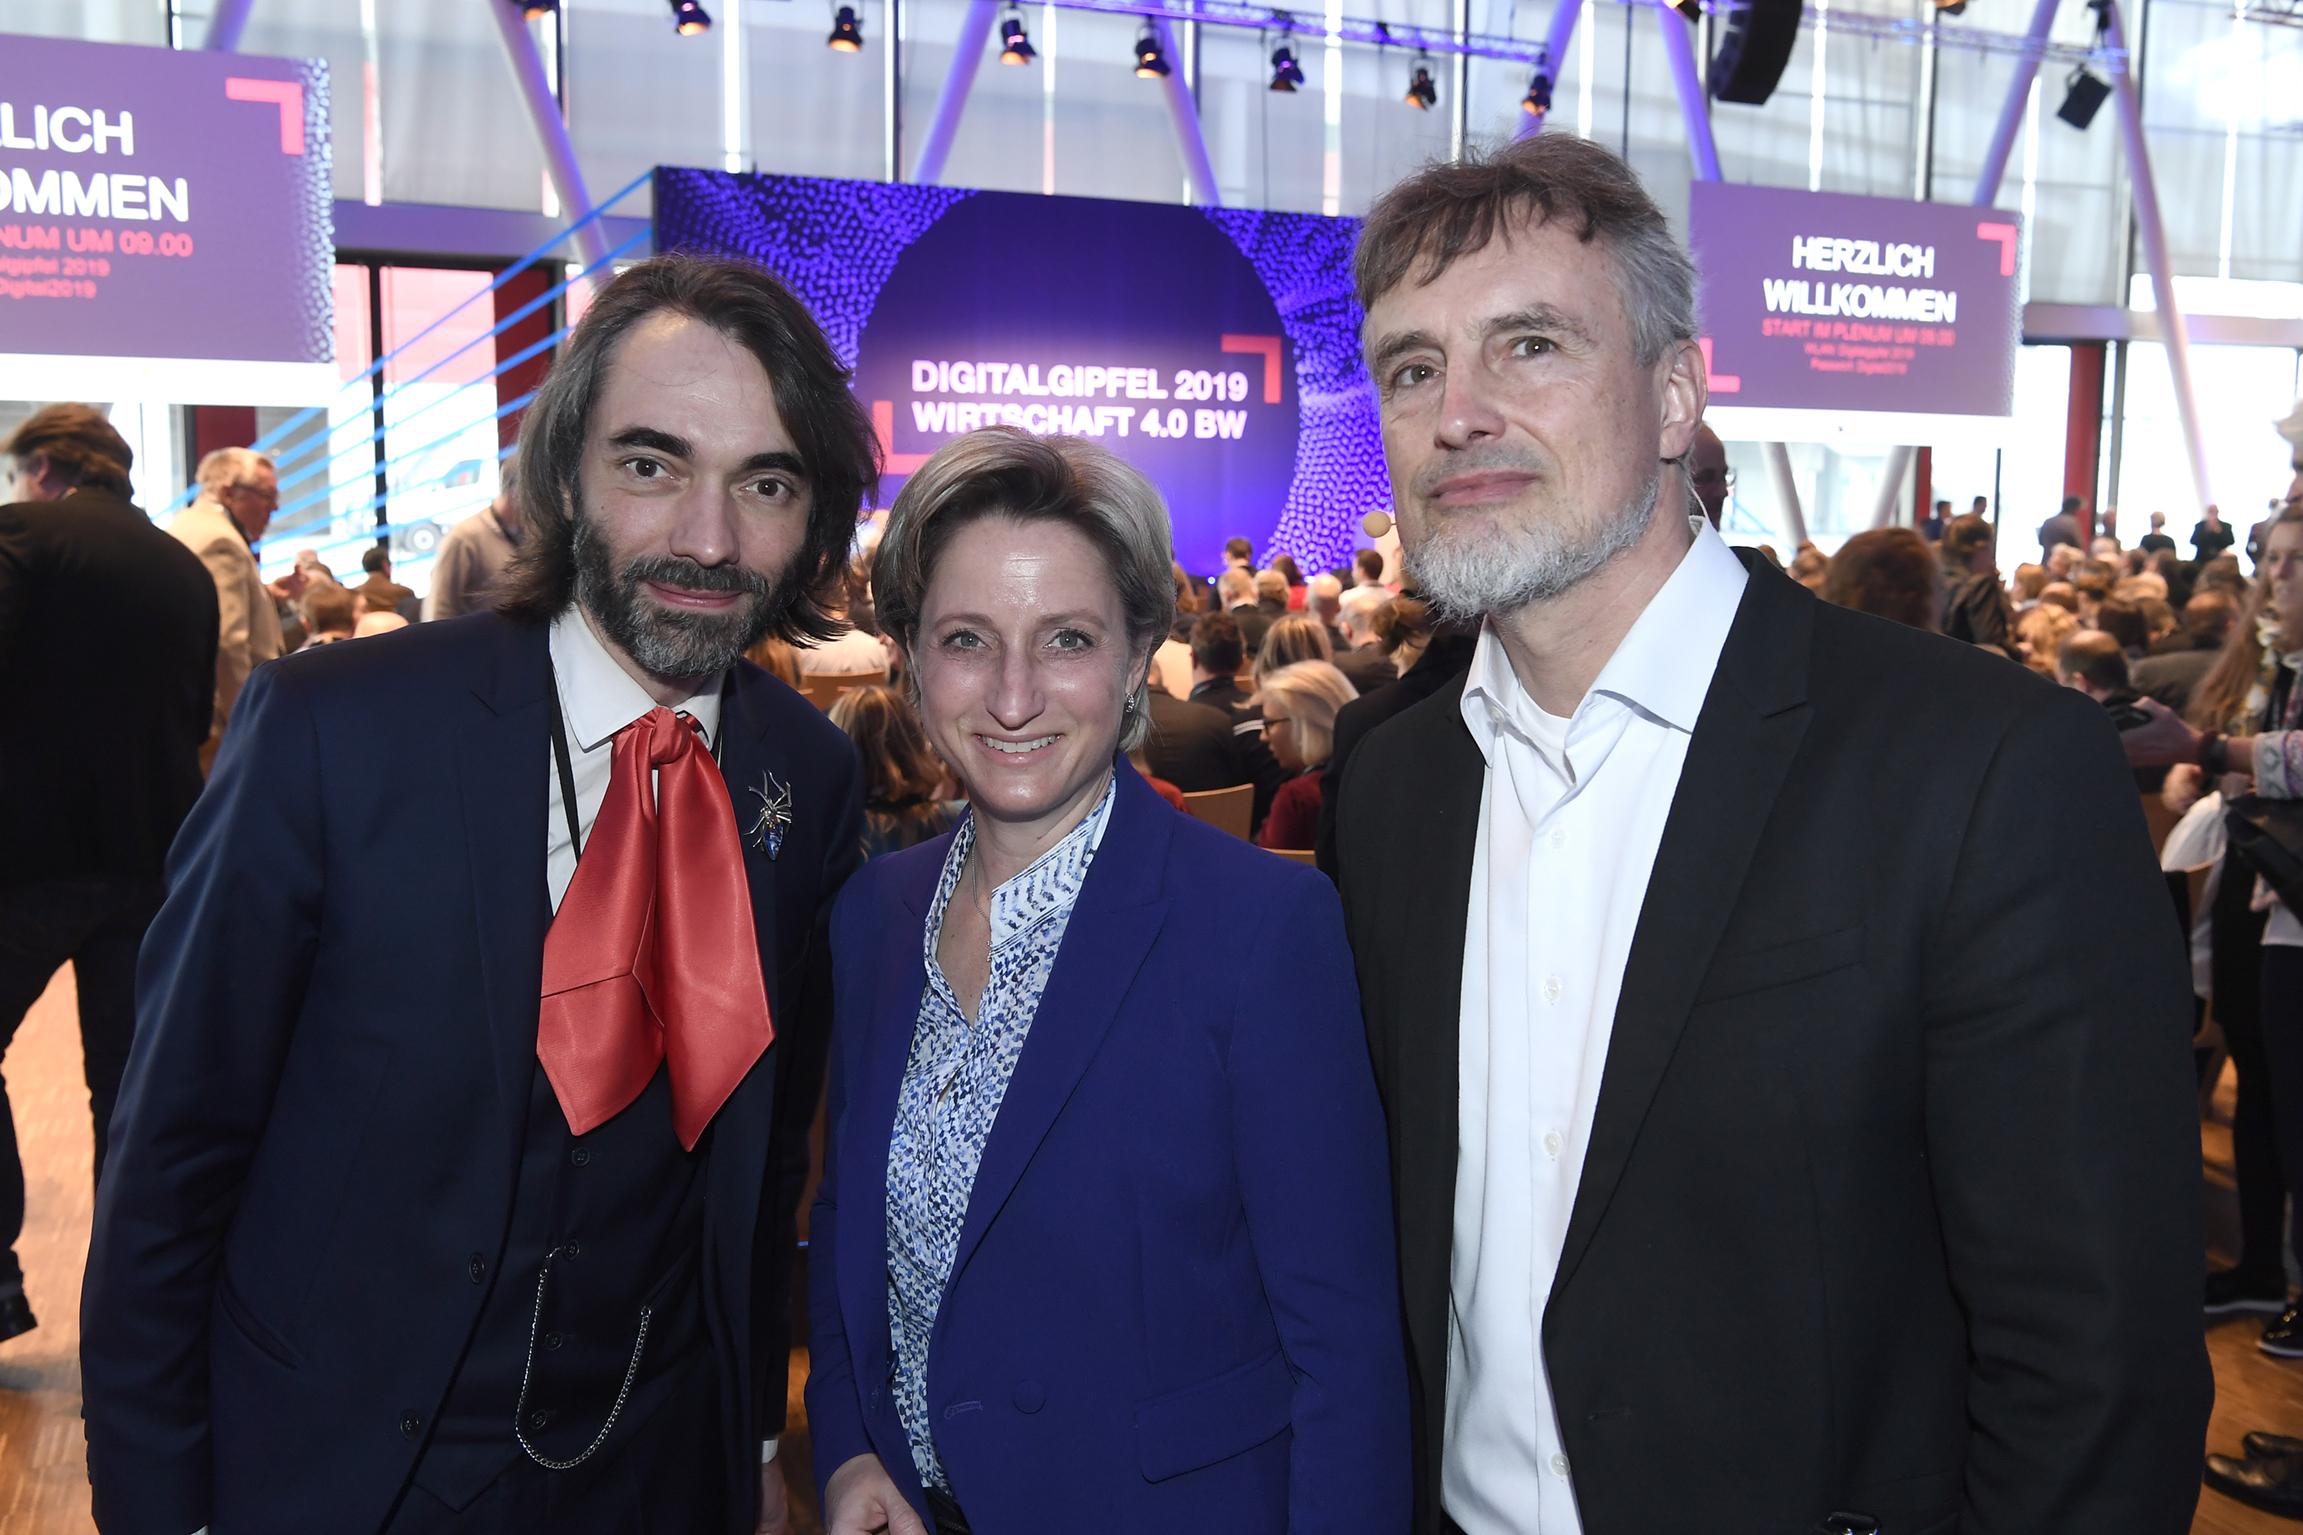 Prof. Dr. Cédric Villani, Dr. Nicole Hoffmeister-Kraut, Prof. Dr. Jürgen Schmidhuber (v.l.n.r.)